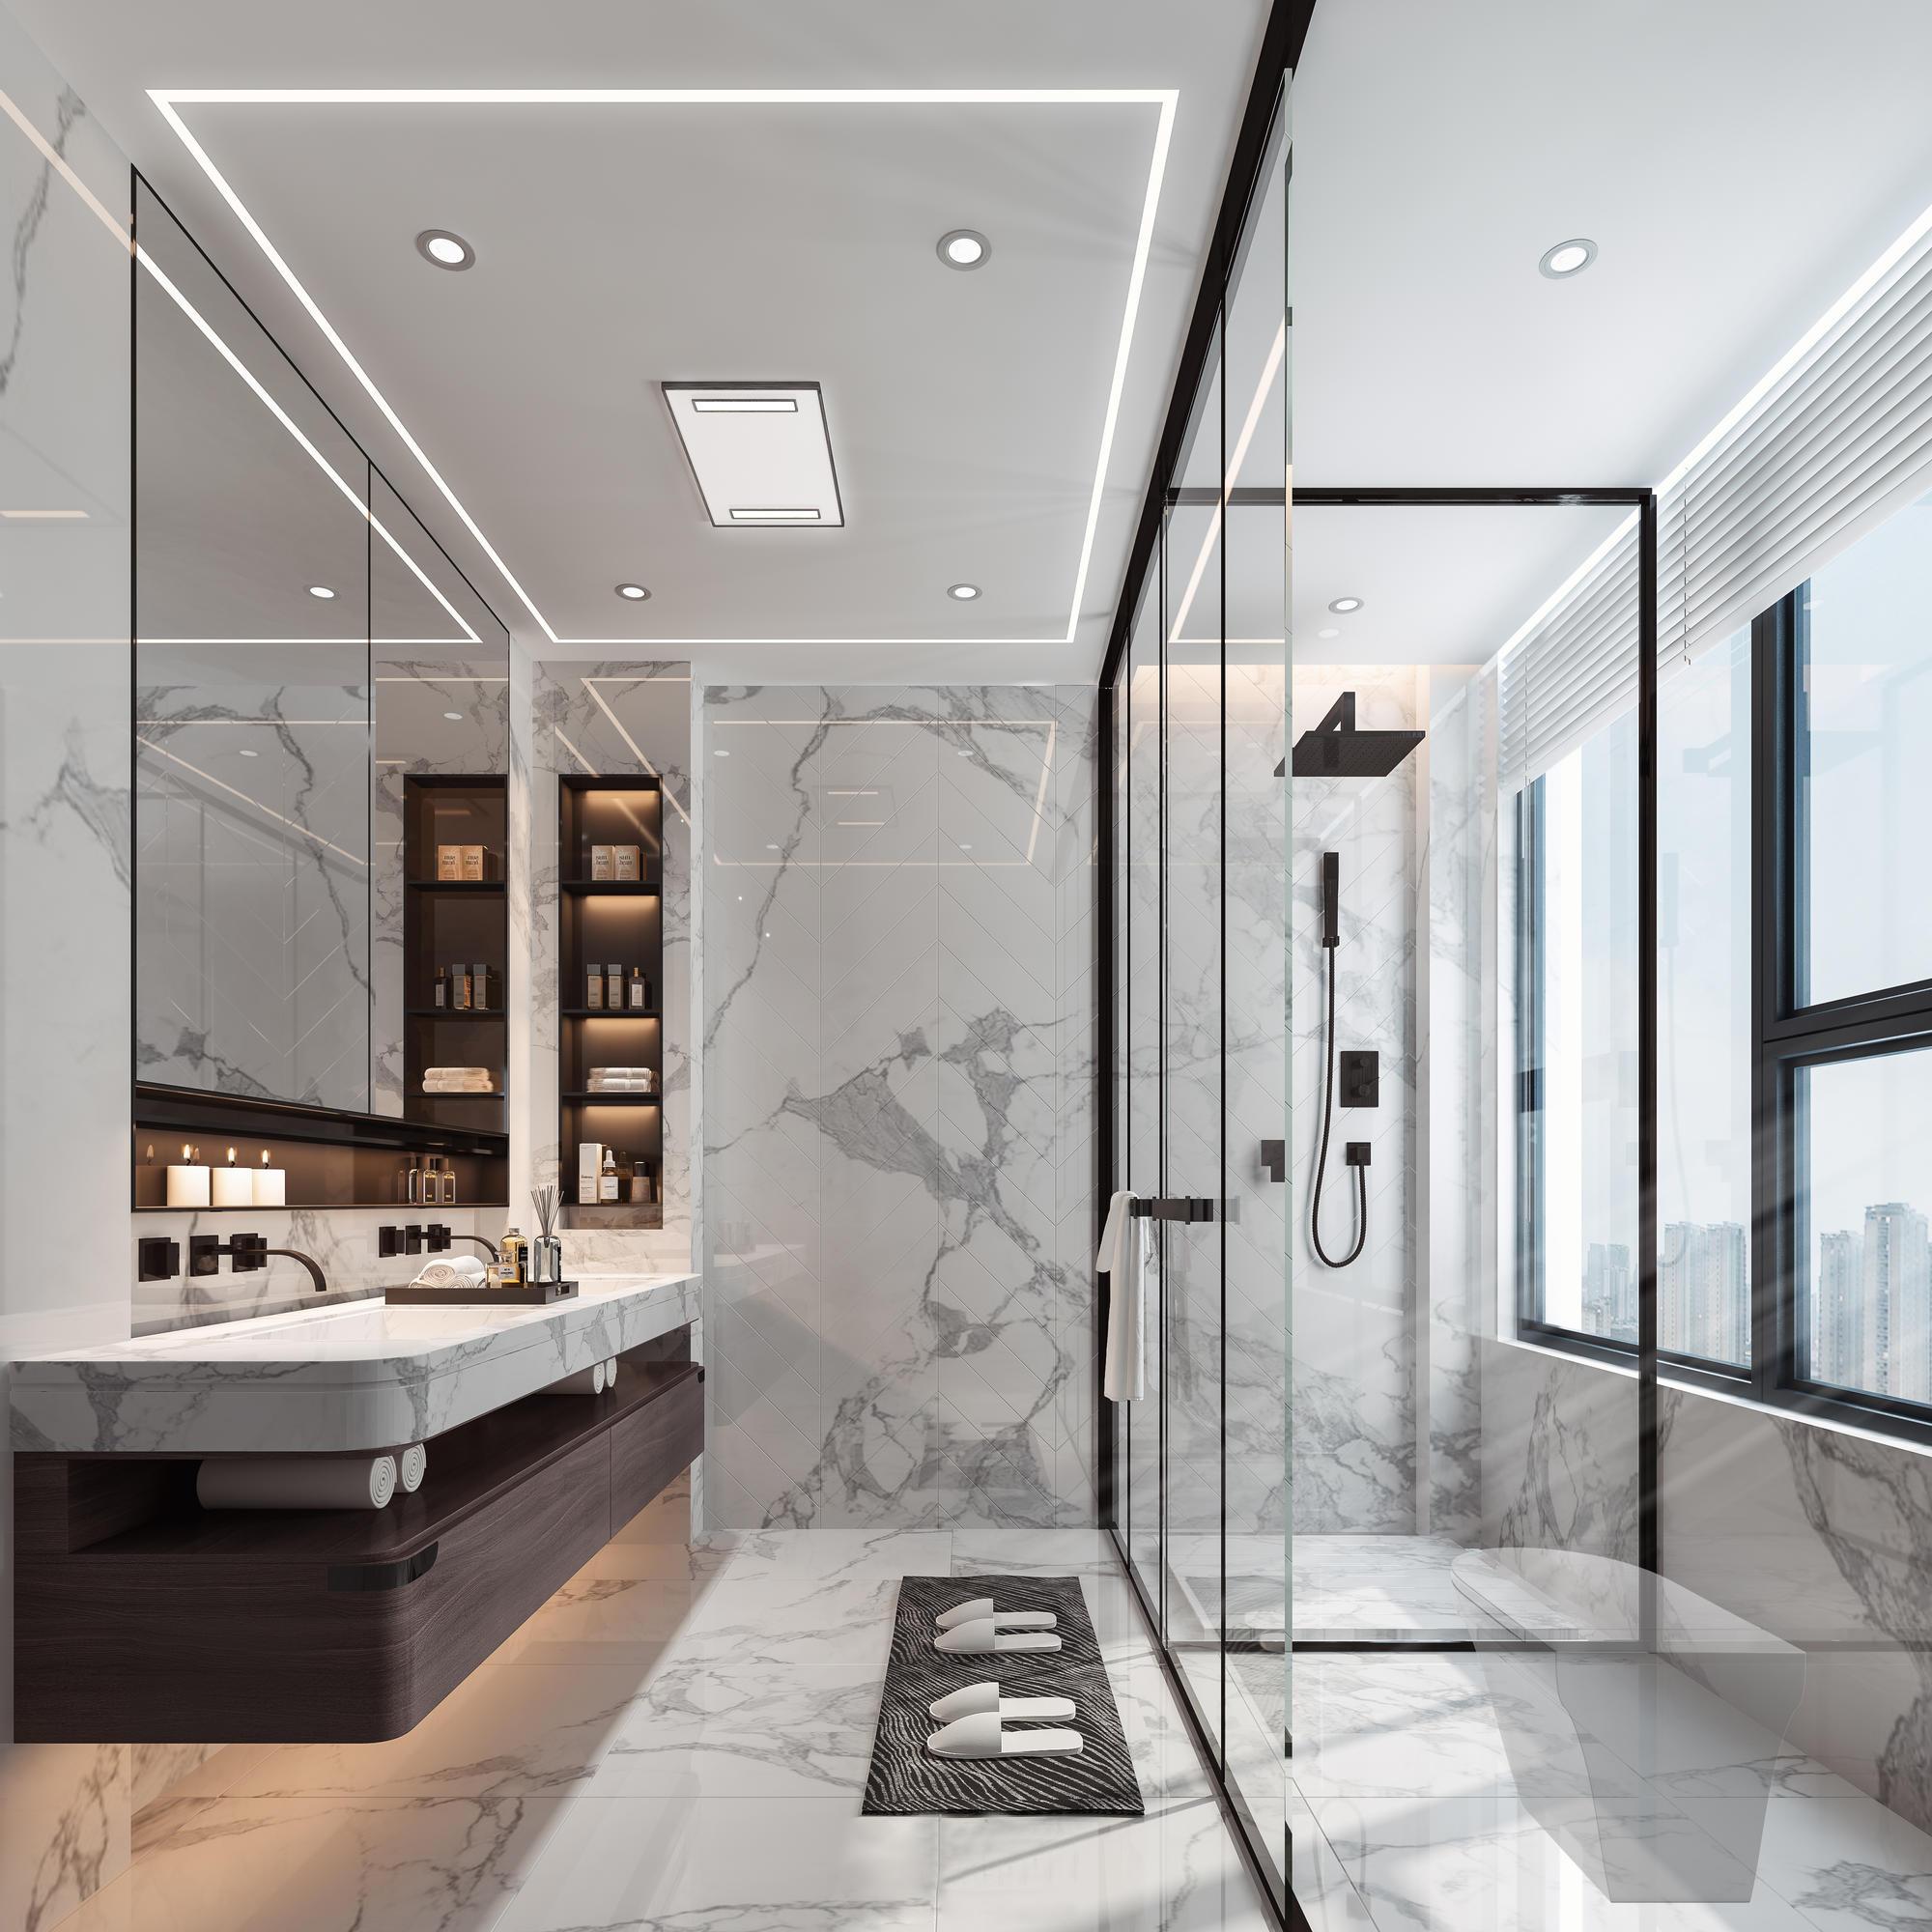 <span style='color: #ff0000'>新房装修</span>真正实用的卫生间设计小技巧!